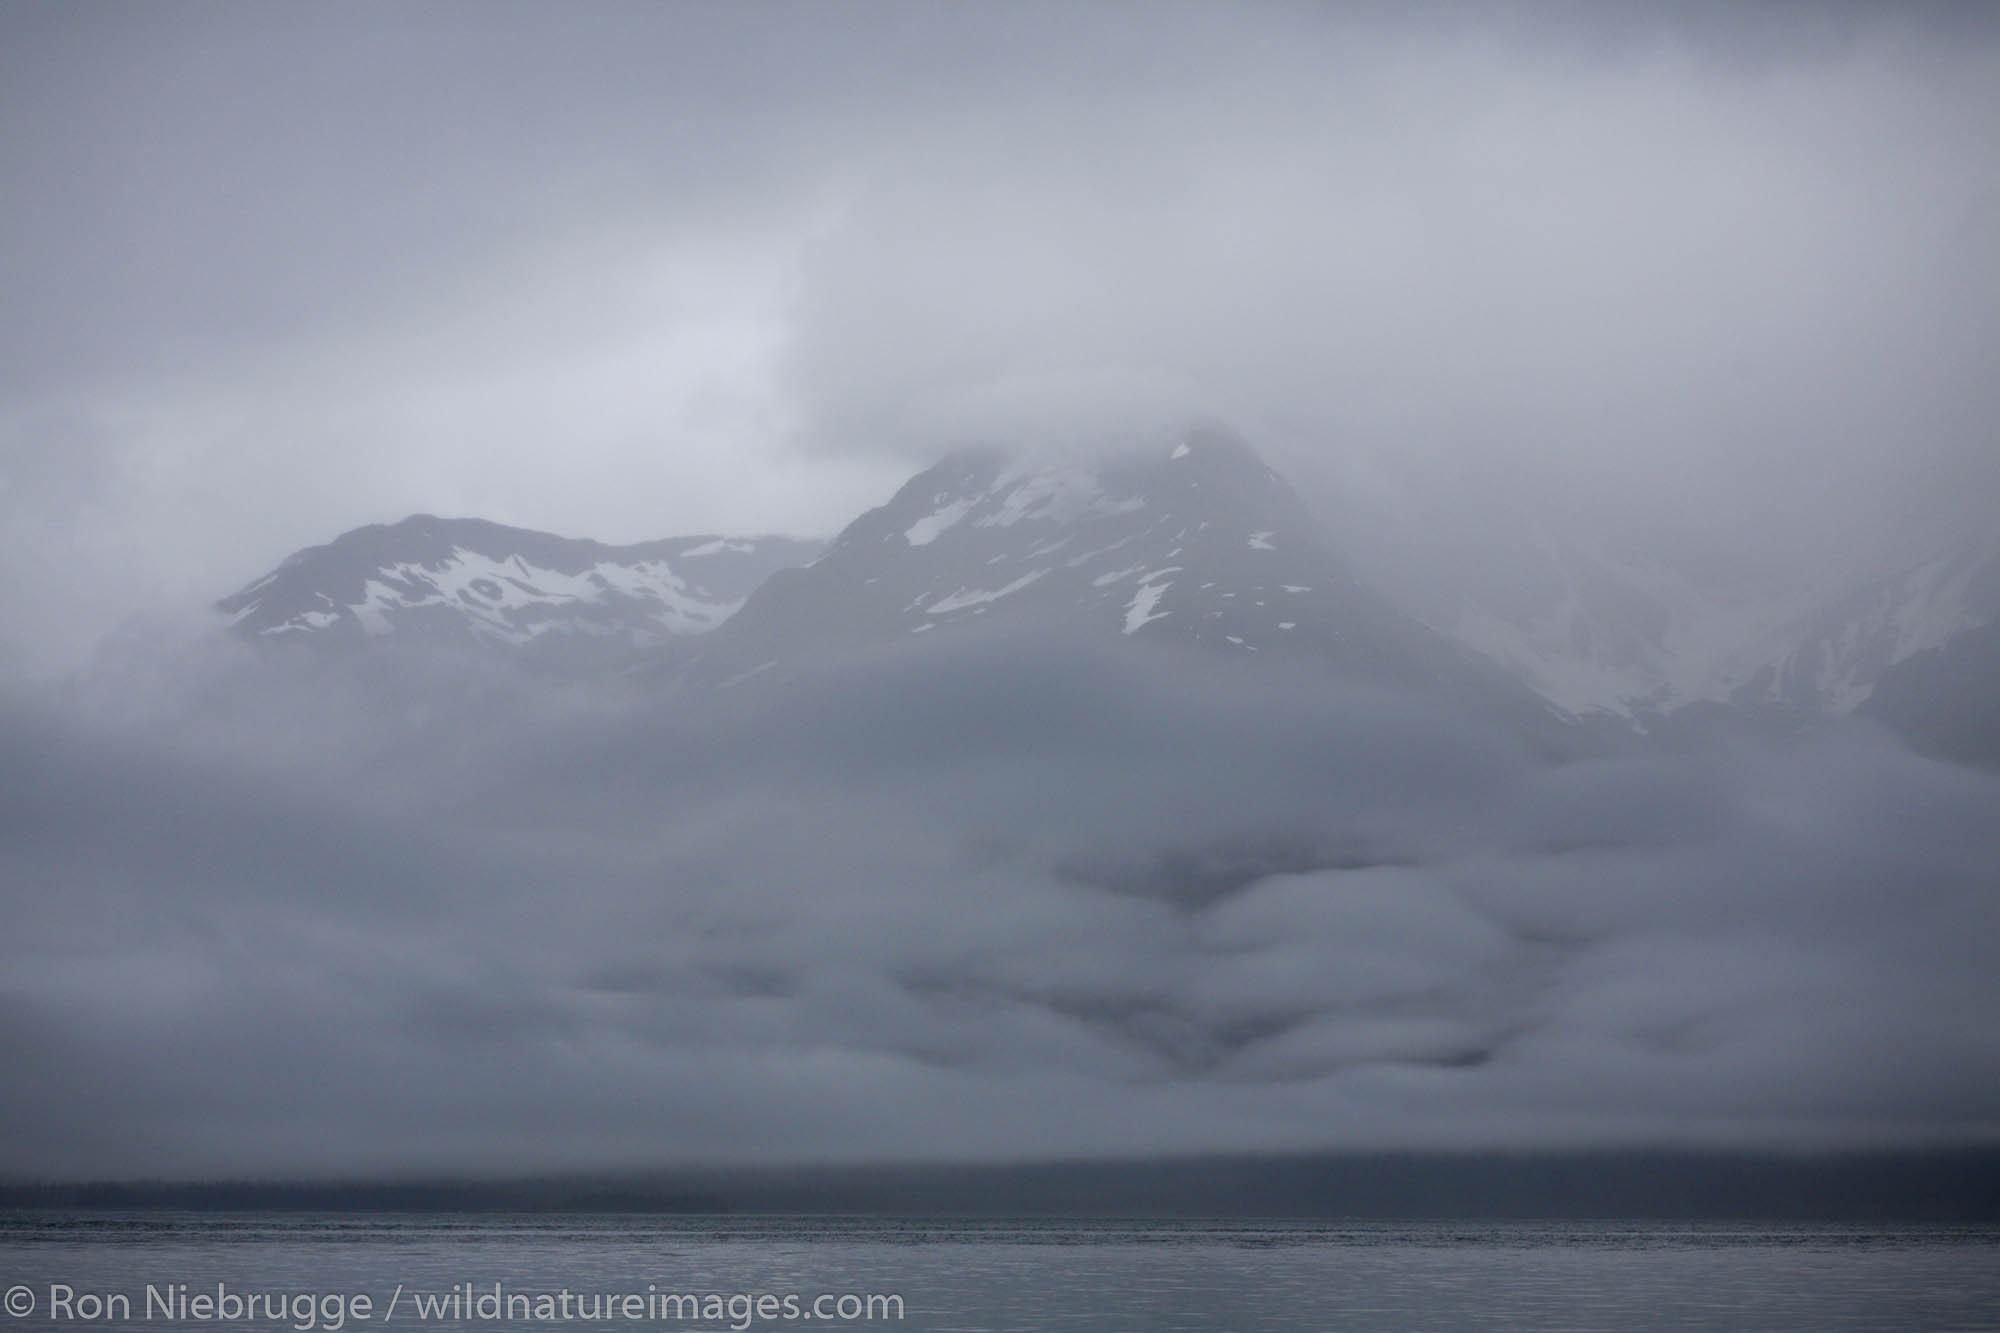 Stormy weather along Barry Arm, Prince William Sound, Chugach National Forest, Alaska.